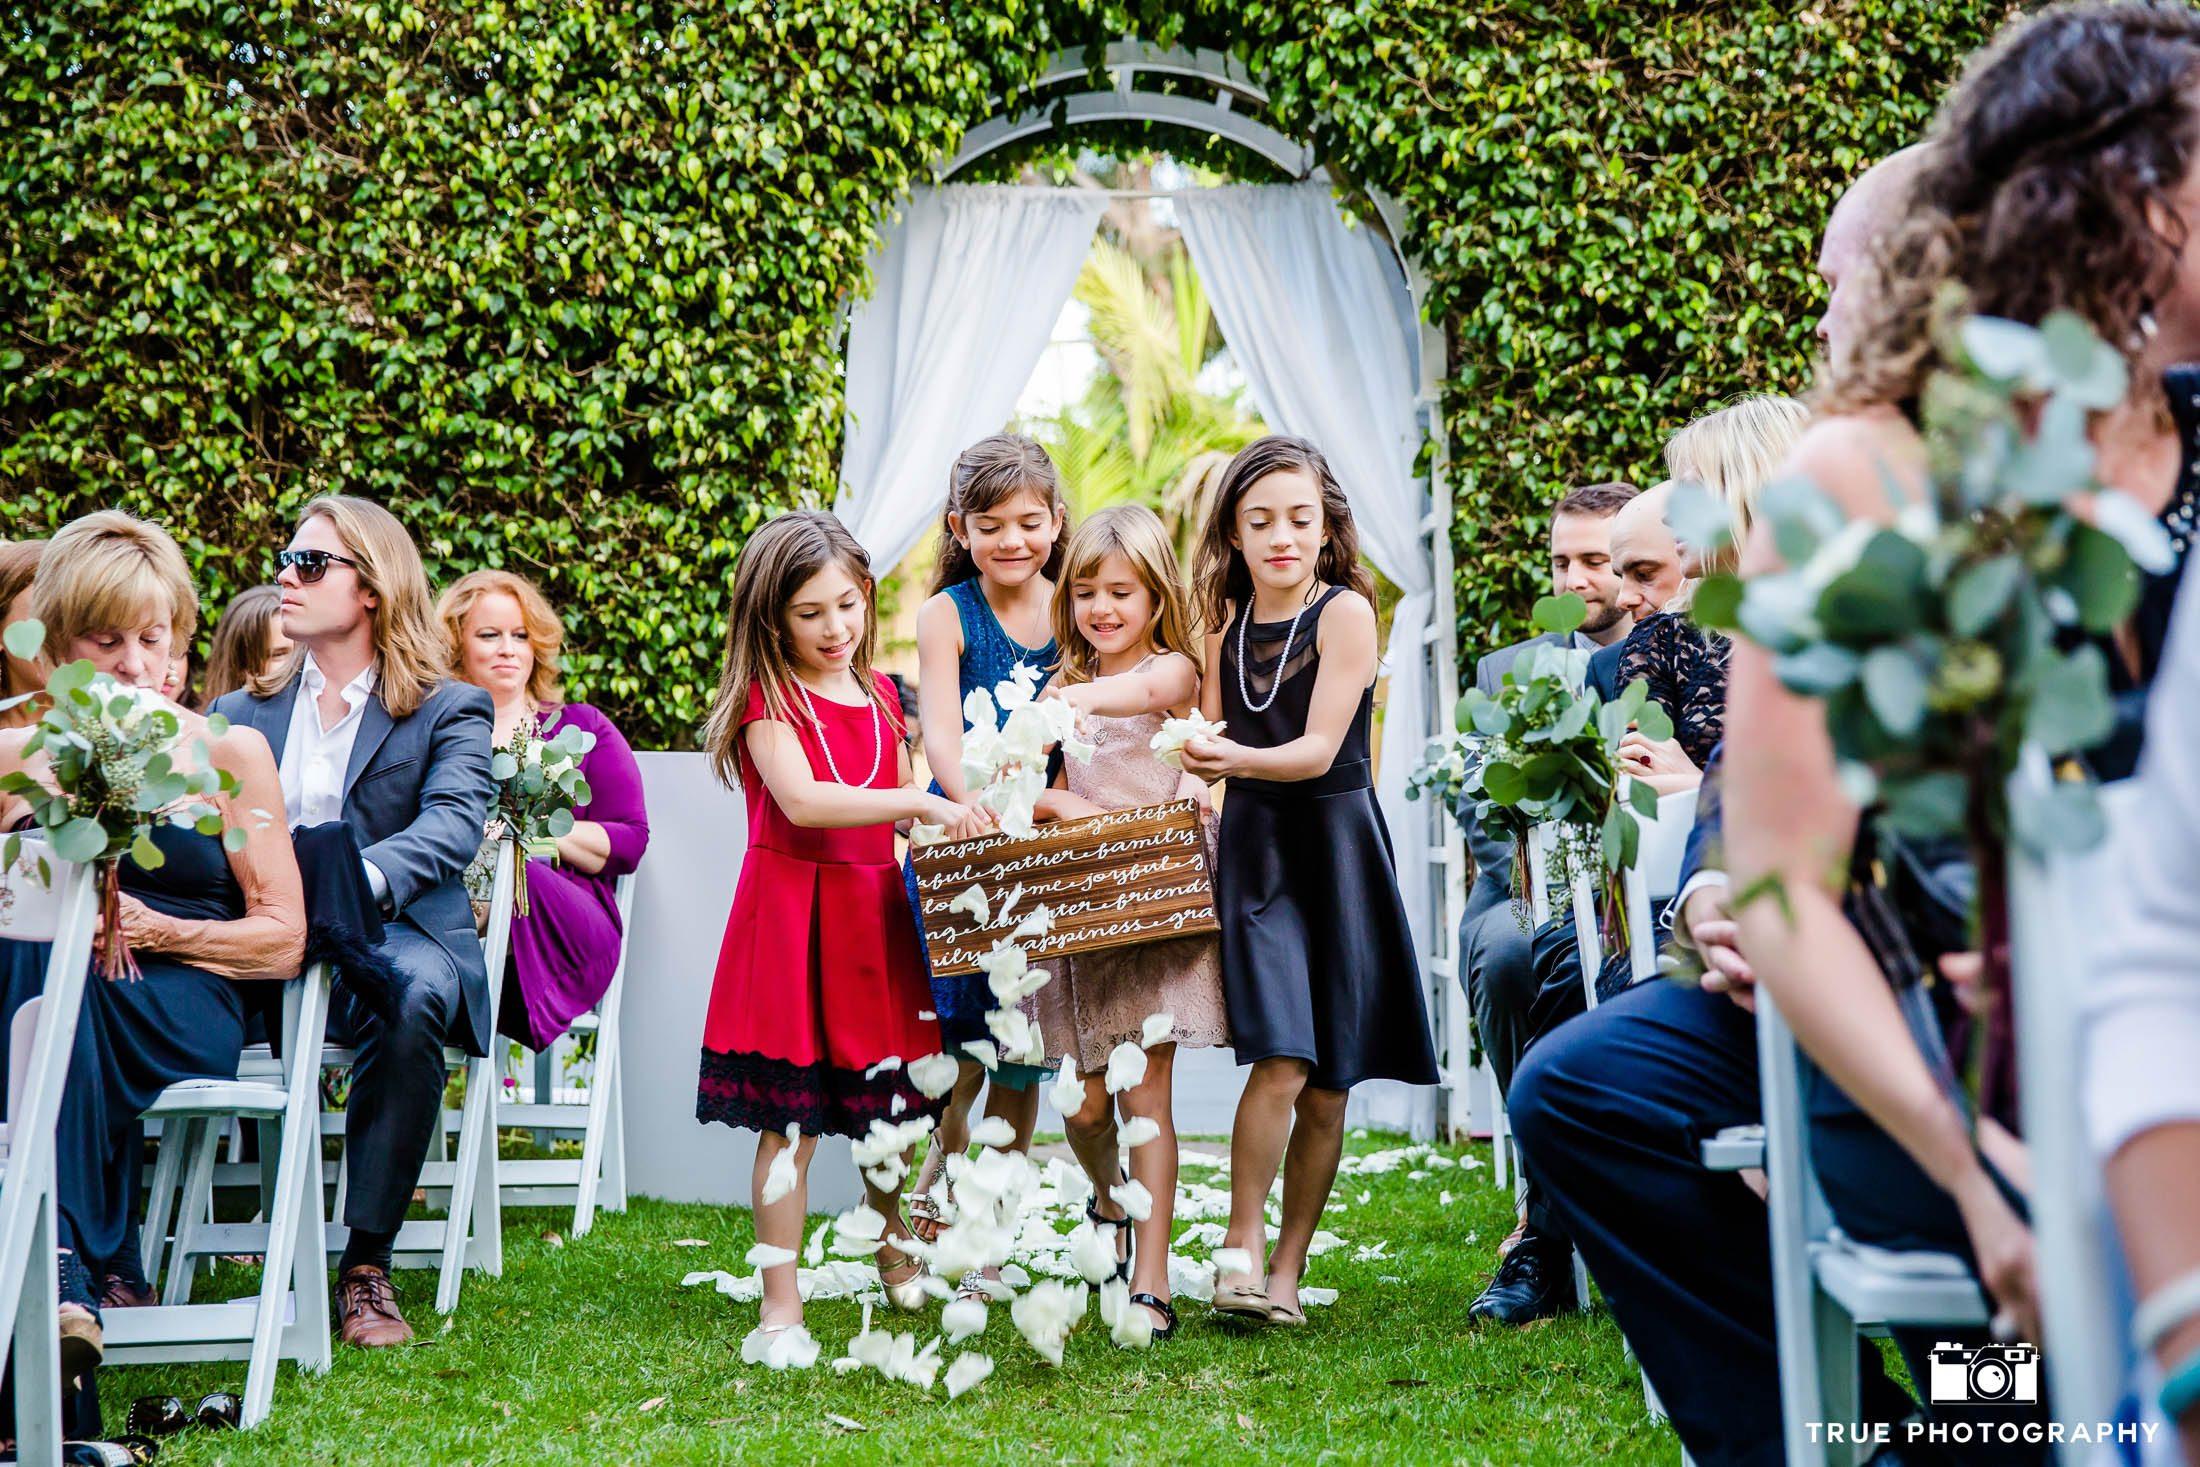 Cute flowergirls throw flowers down aisle at wedding